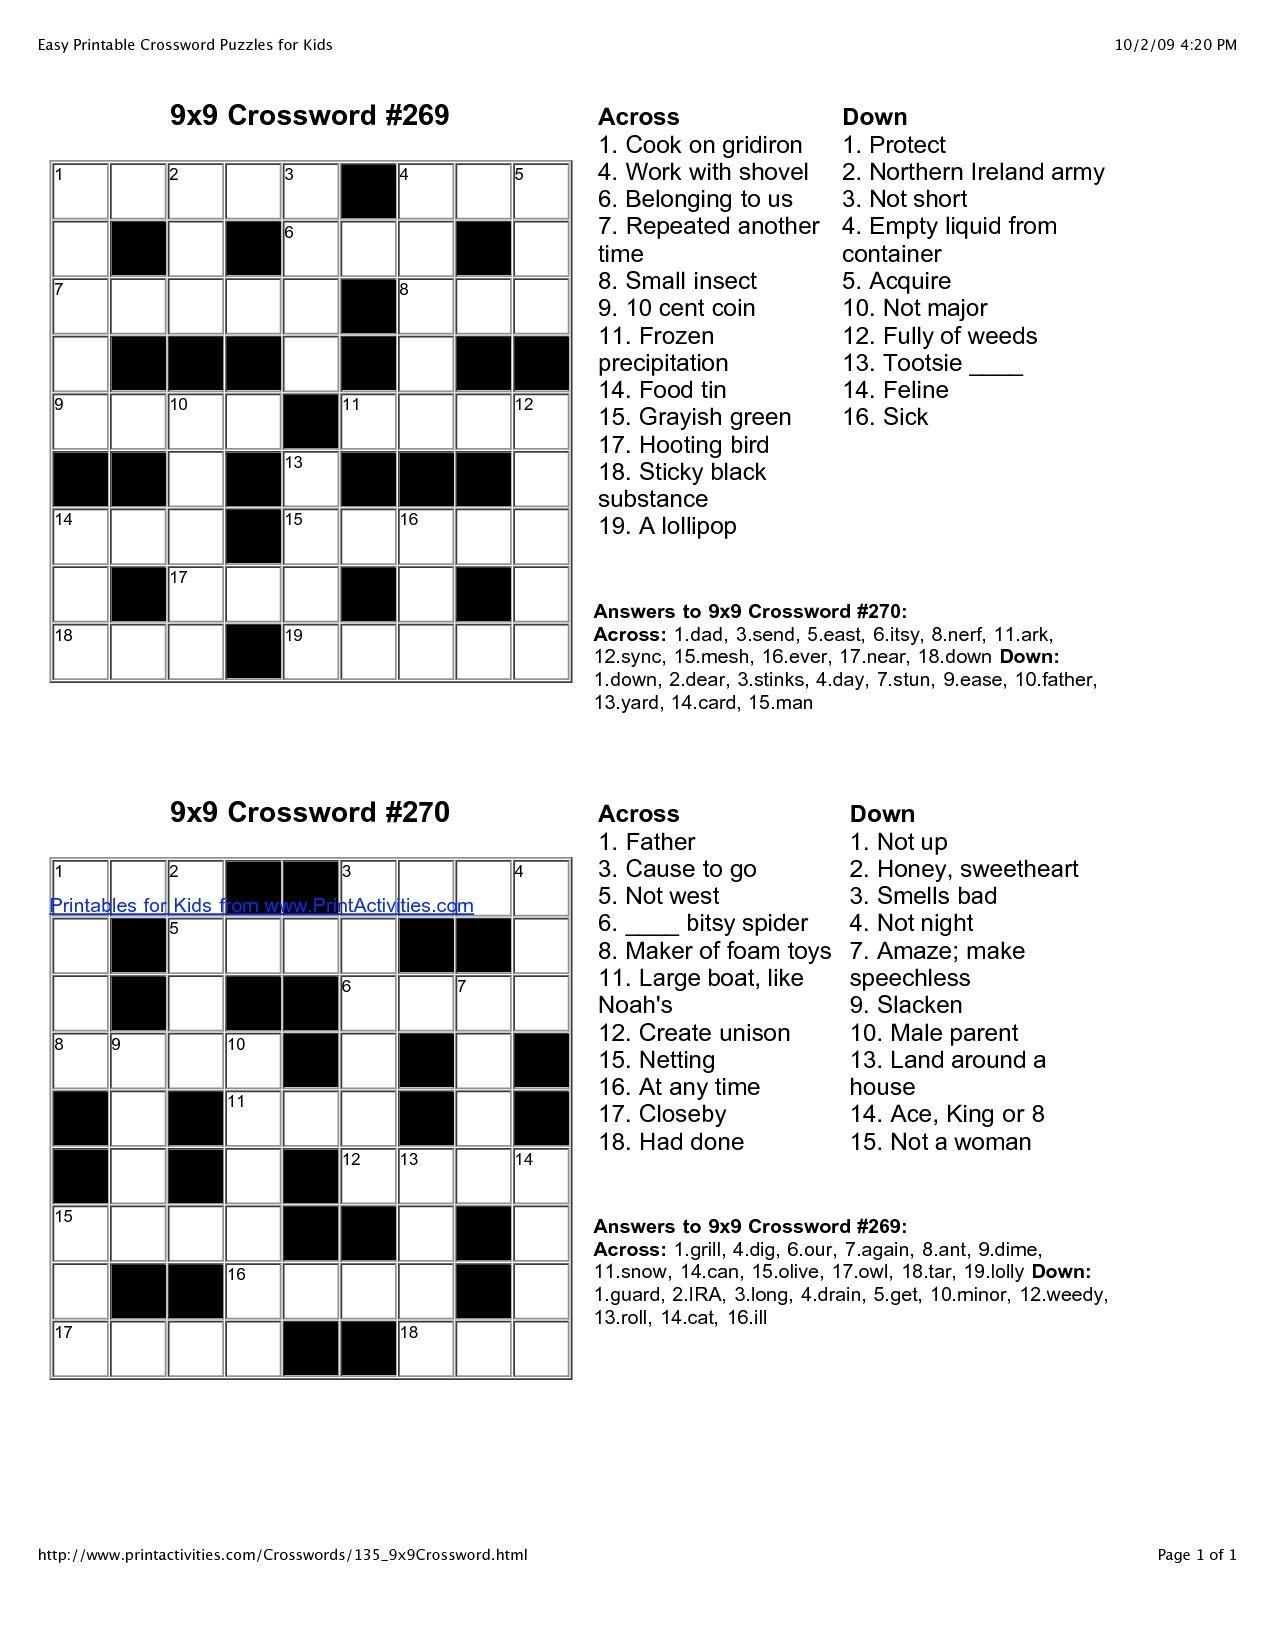 Stylist And Luxury Crossword Puzzles Easy Printable